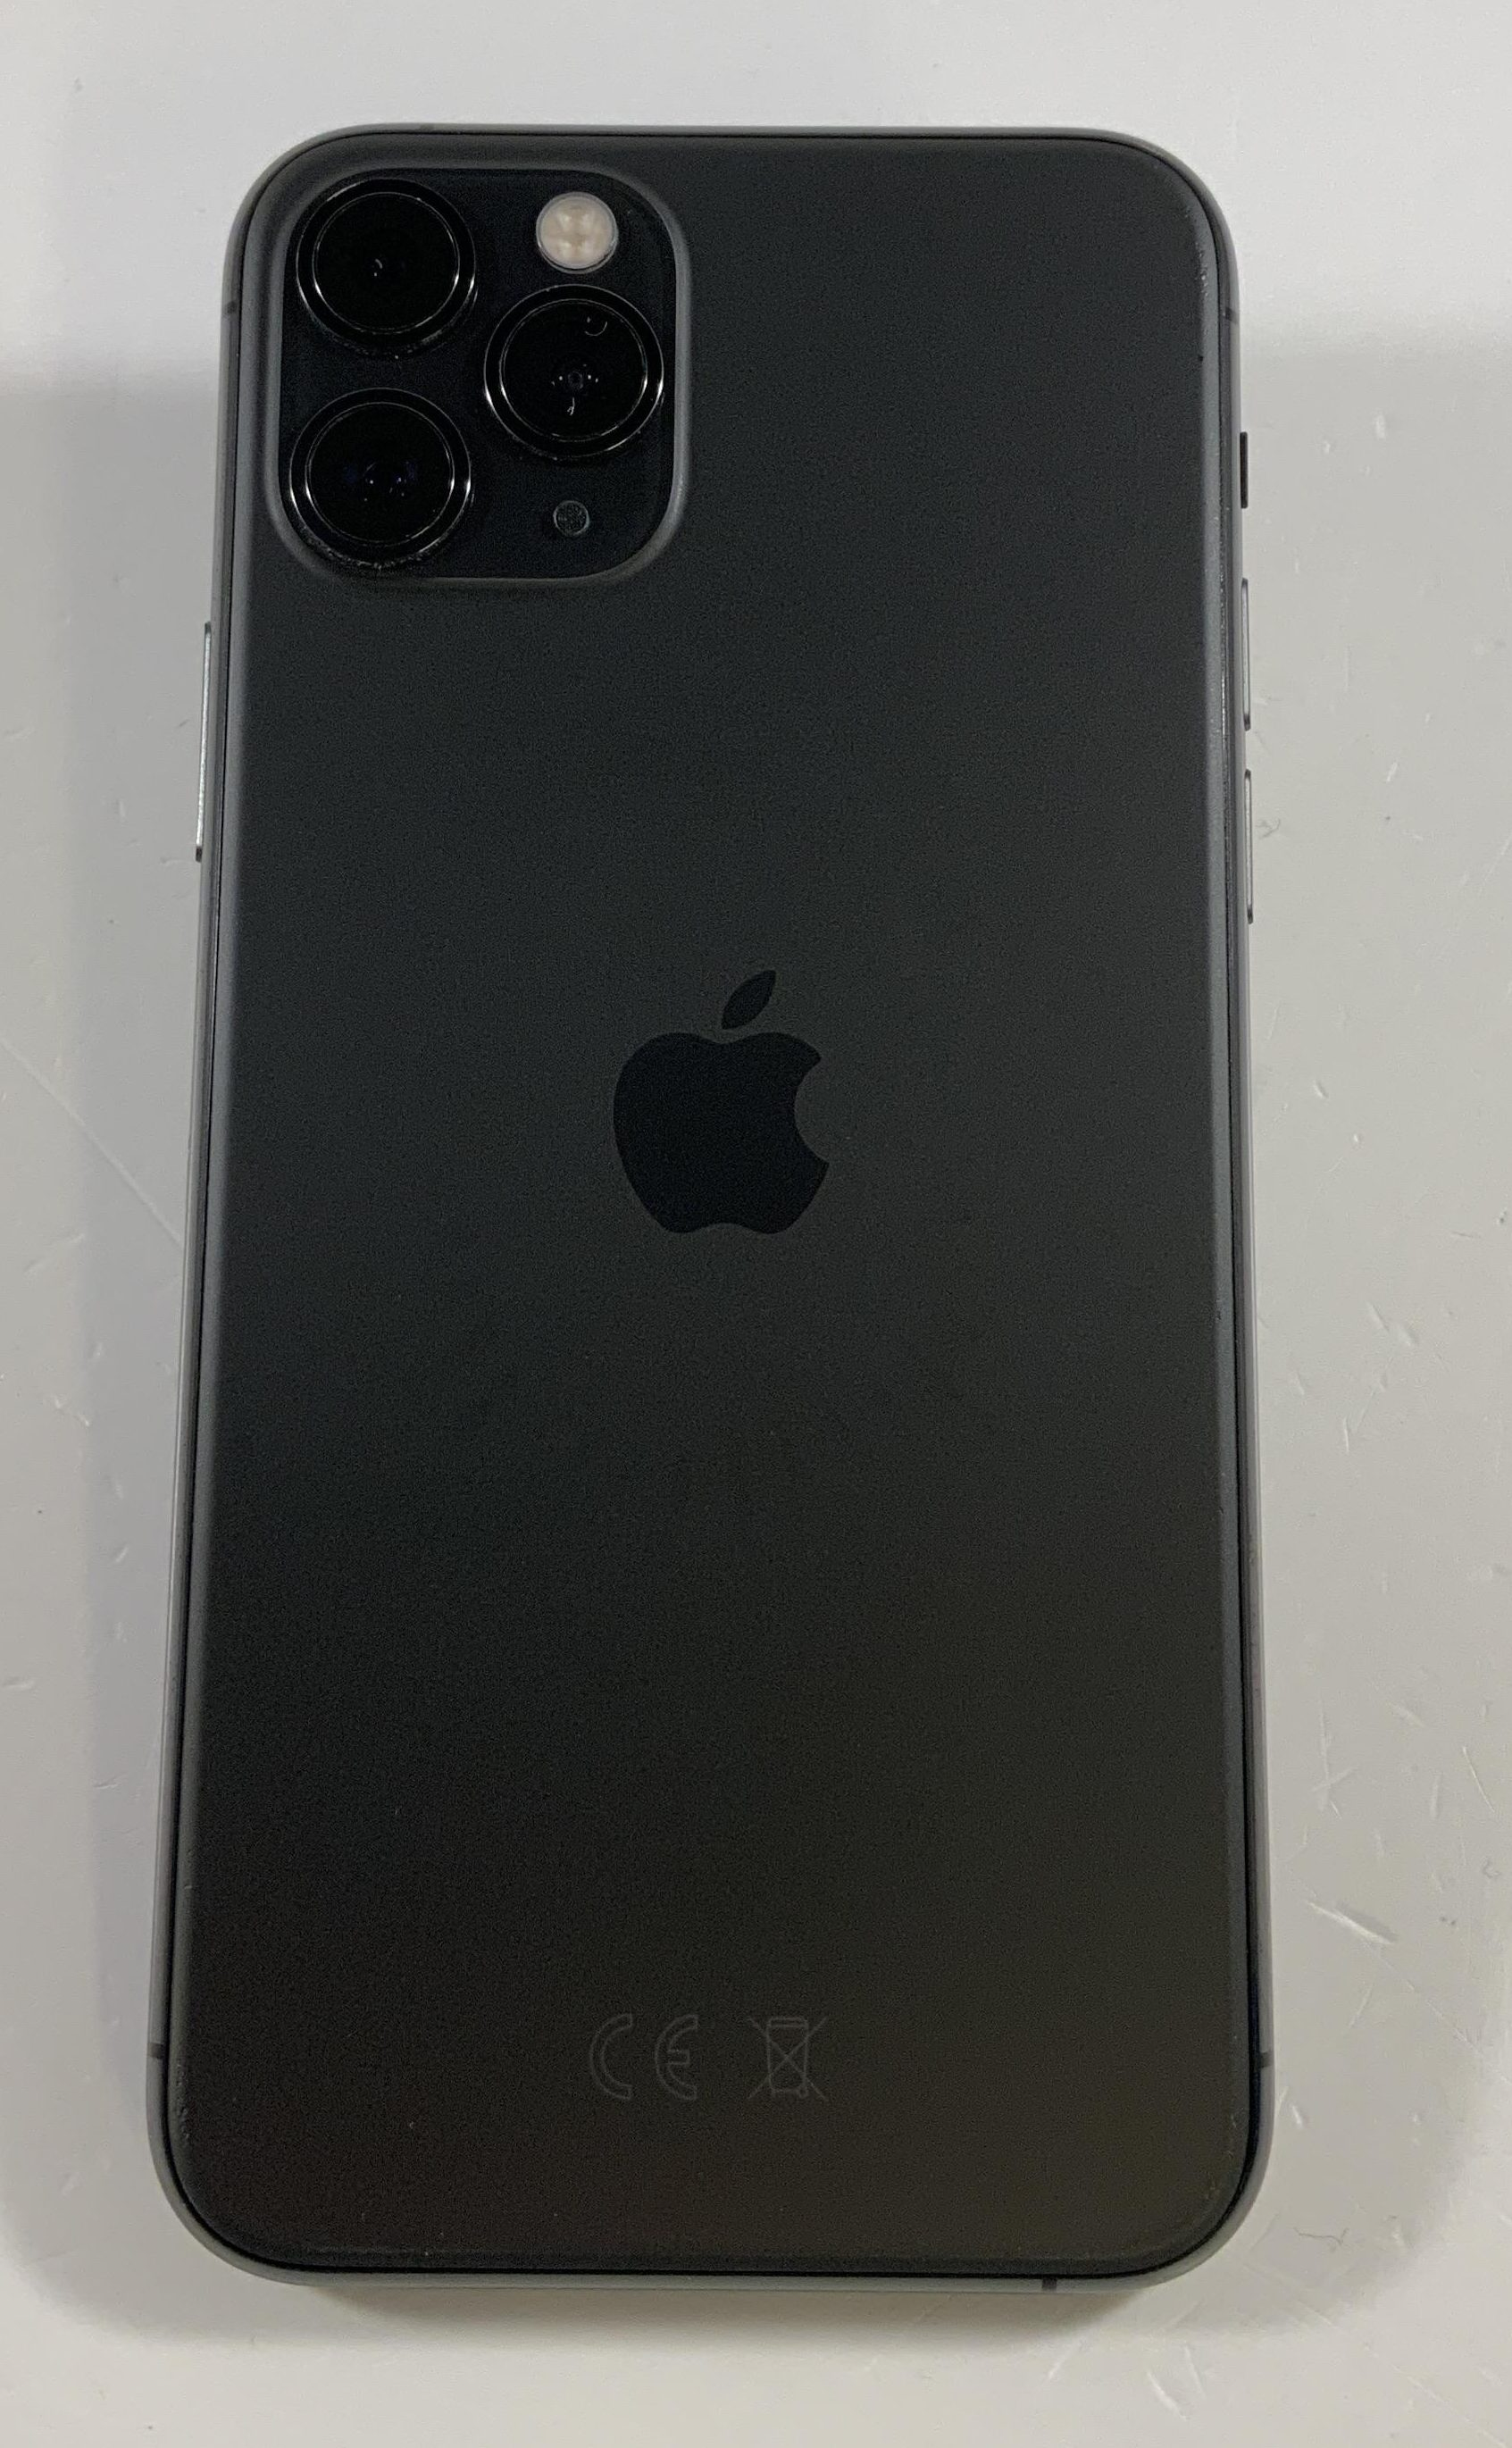 iPhone 11 Pro 256GB, 256GB, Space Gray, obraz 2